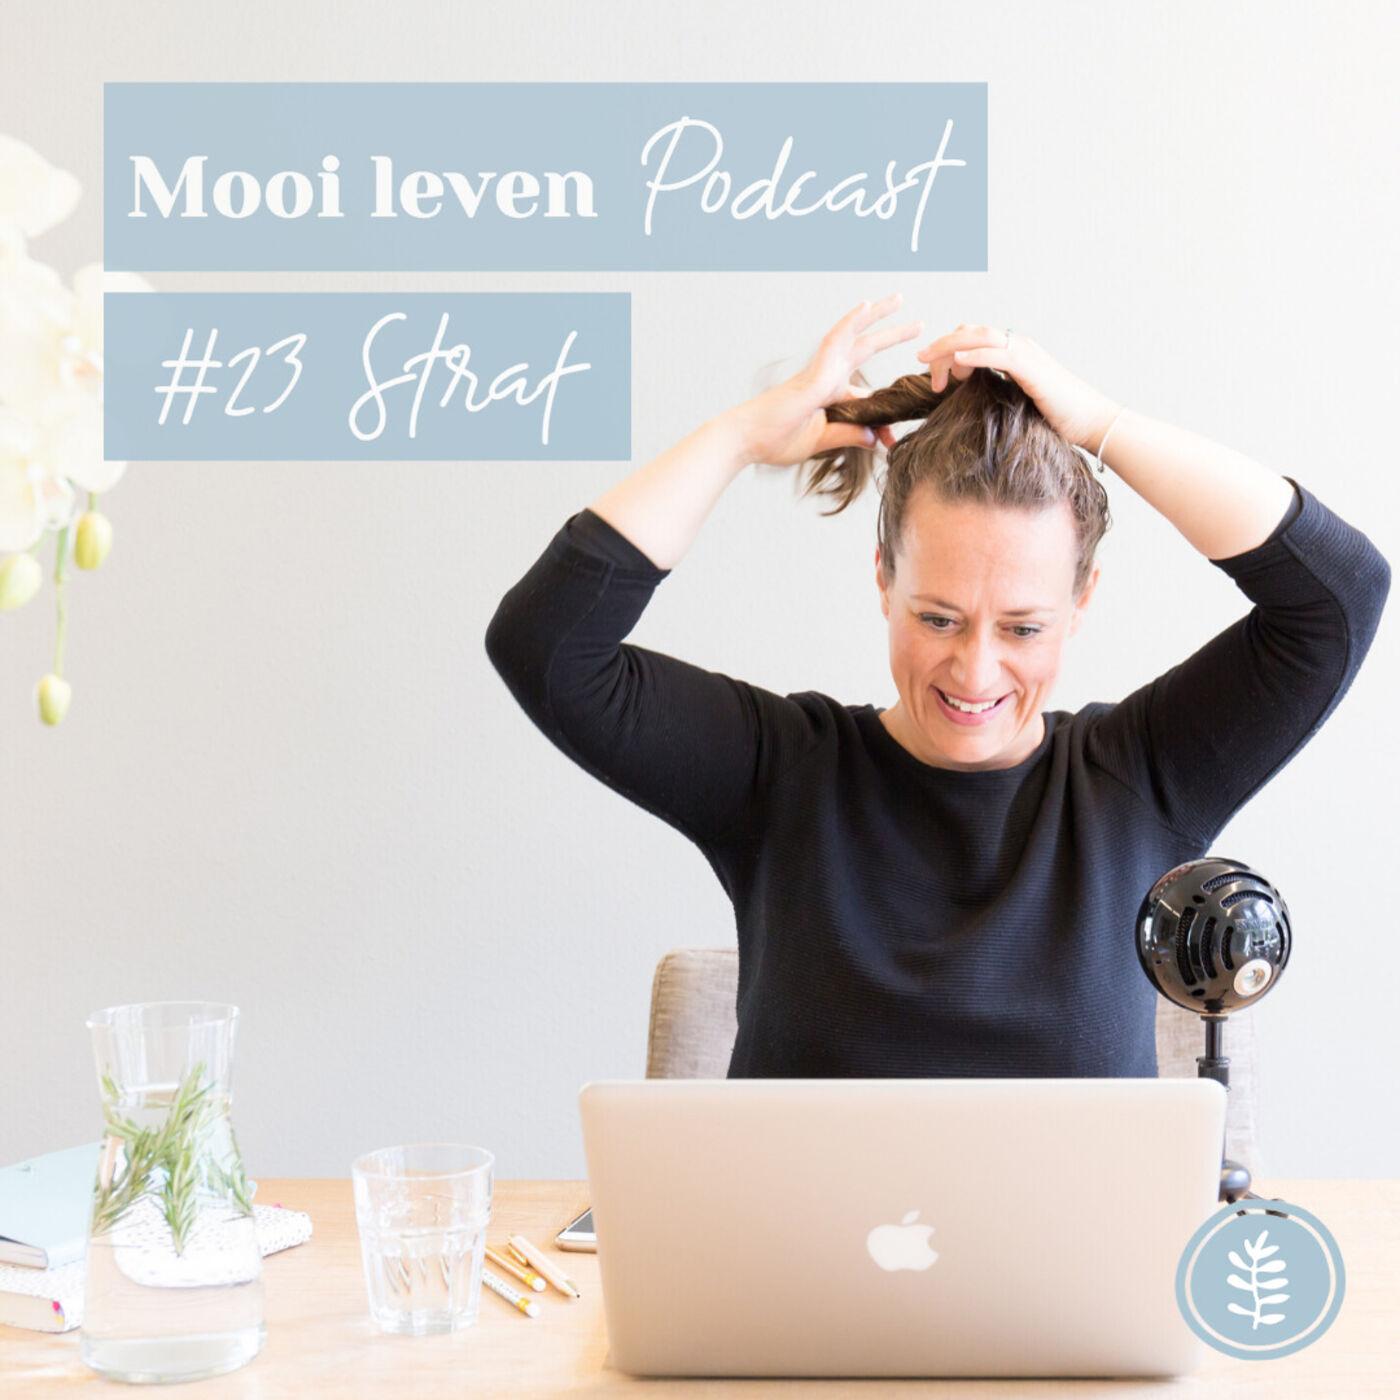 Mooi Leven Podcast #23 | Straf